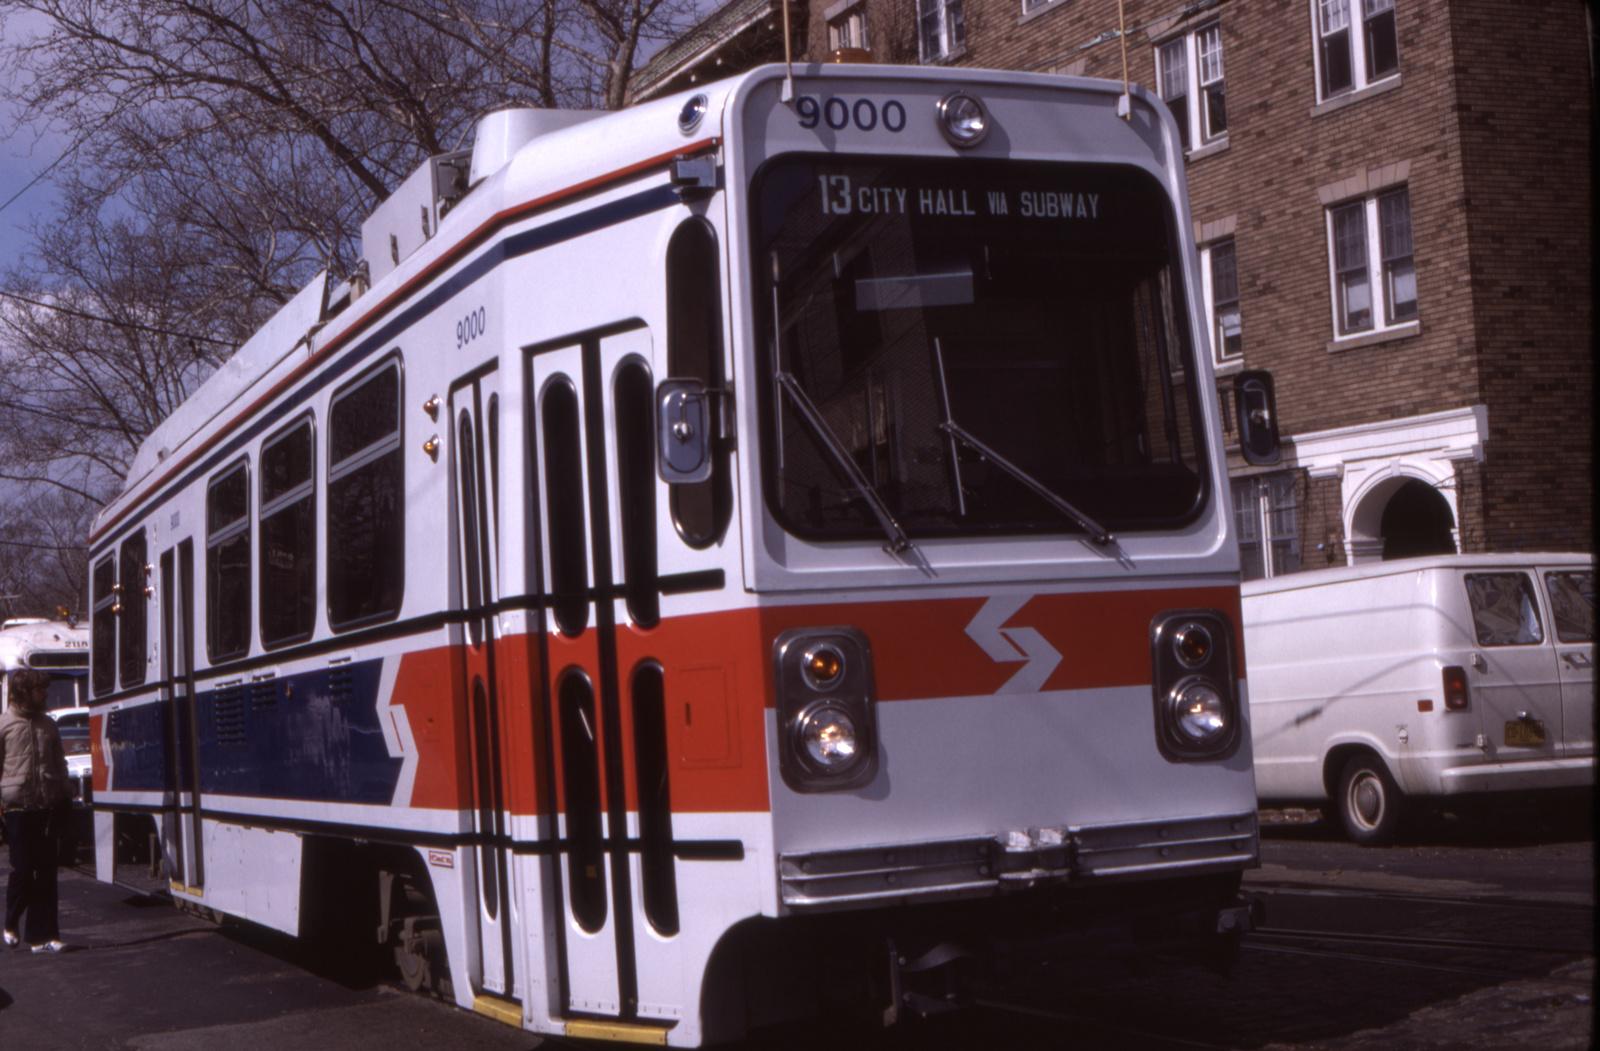 (618k, 1600x1051)<br><b>Country:</b> United States<br><b>City:</b> Philadelphia, PA<br><b>System:</b> SEPTA (or Predecessor)<br><b>Line:</b> Rt. 13-Yeadon/Darby<br><b>Location:</b> Chester/42nd<br><b>Car:</b> SEPTA K Single-ended (Kawasaki, 1981) 9000 <br><b>Collection of:</b> David Pirmann<br><b>Date:</b> 3/1981<br><b>Viewed (this week/total):</b> 1 / 89